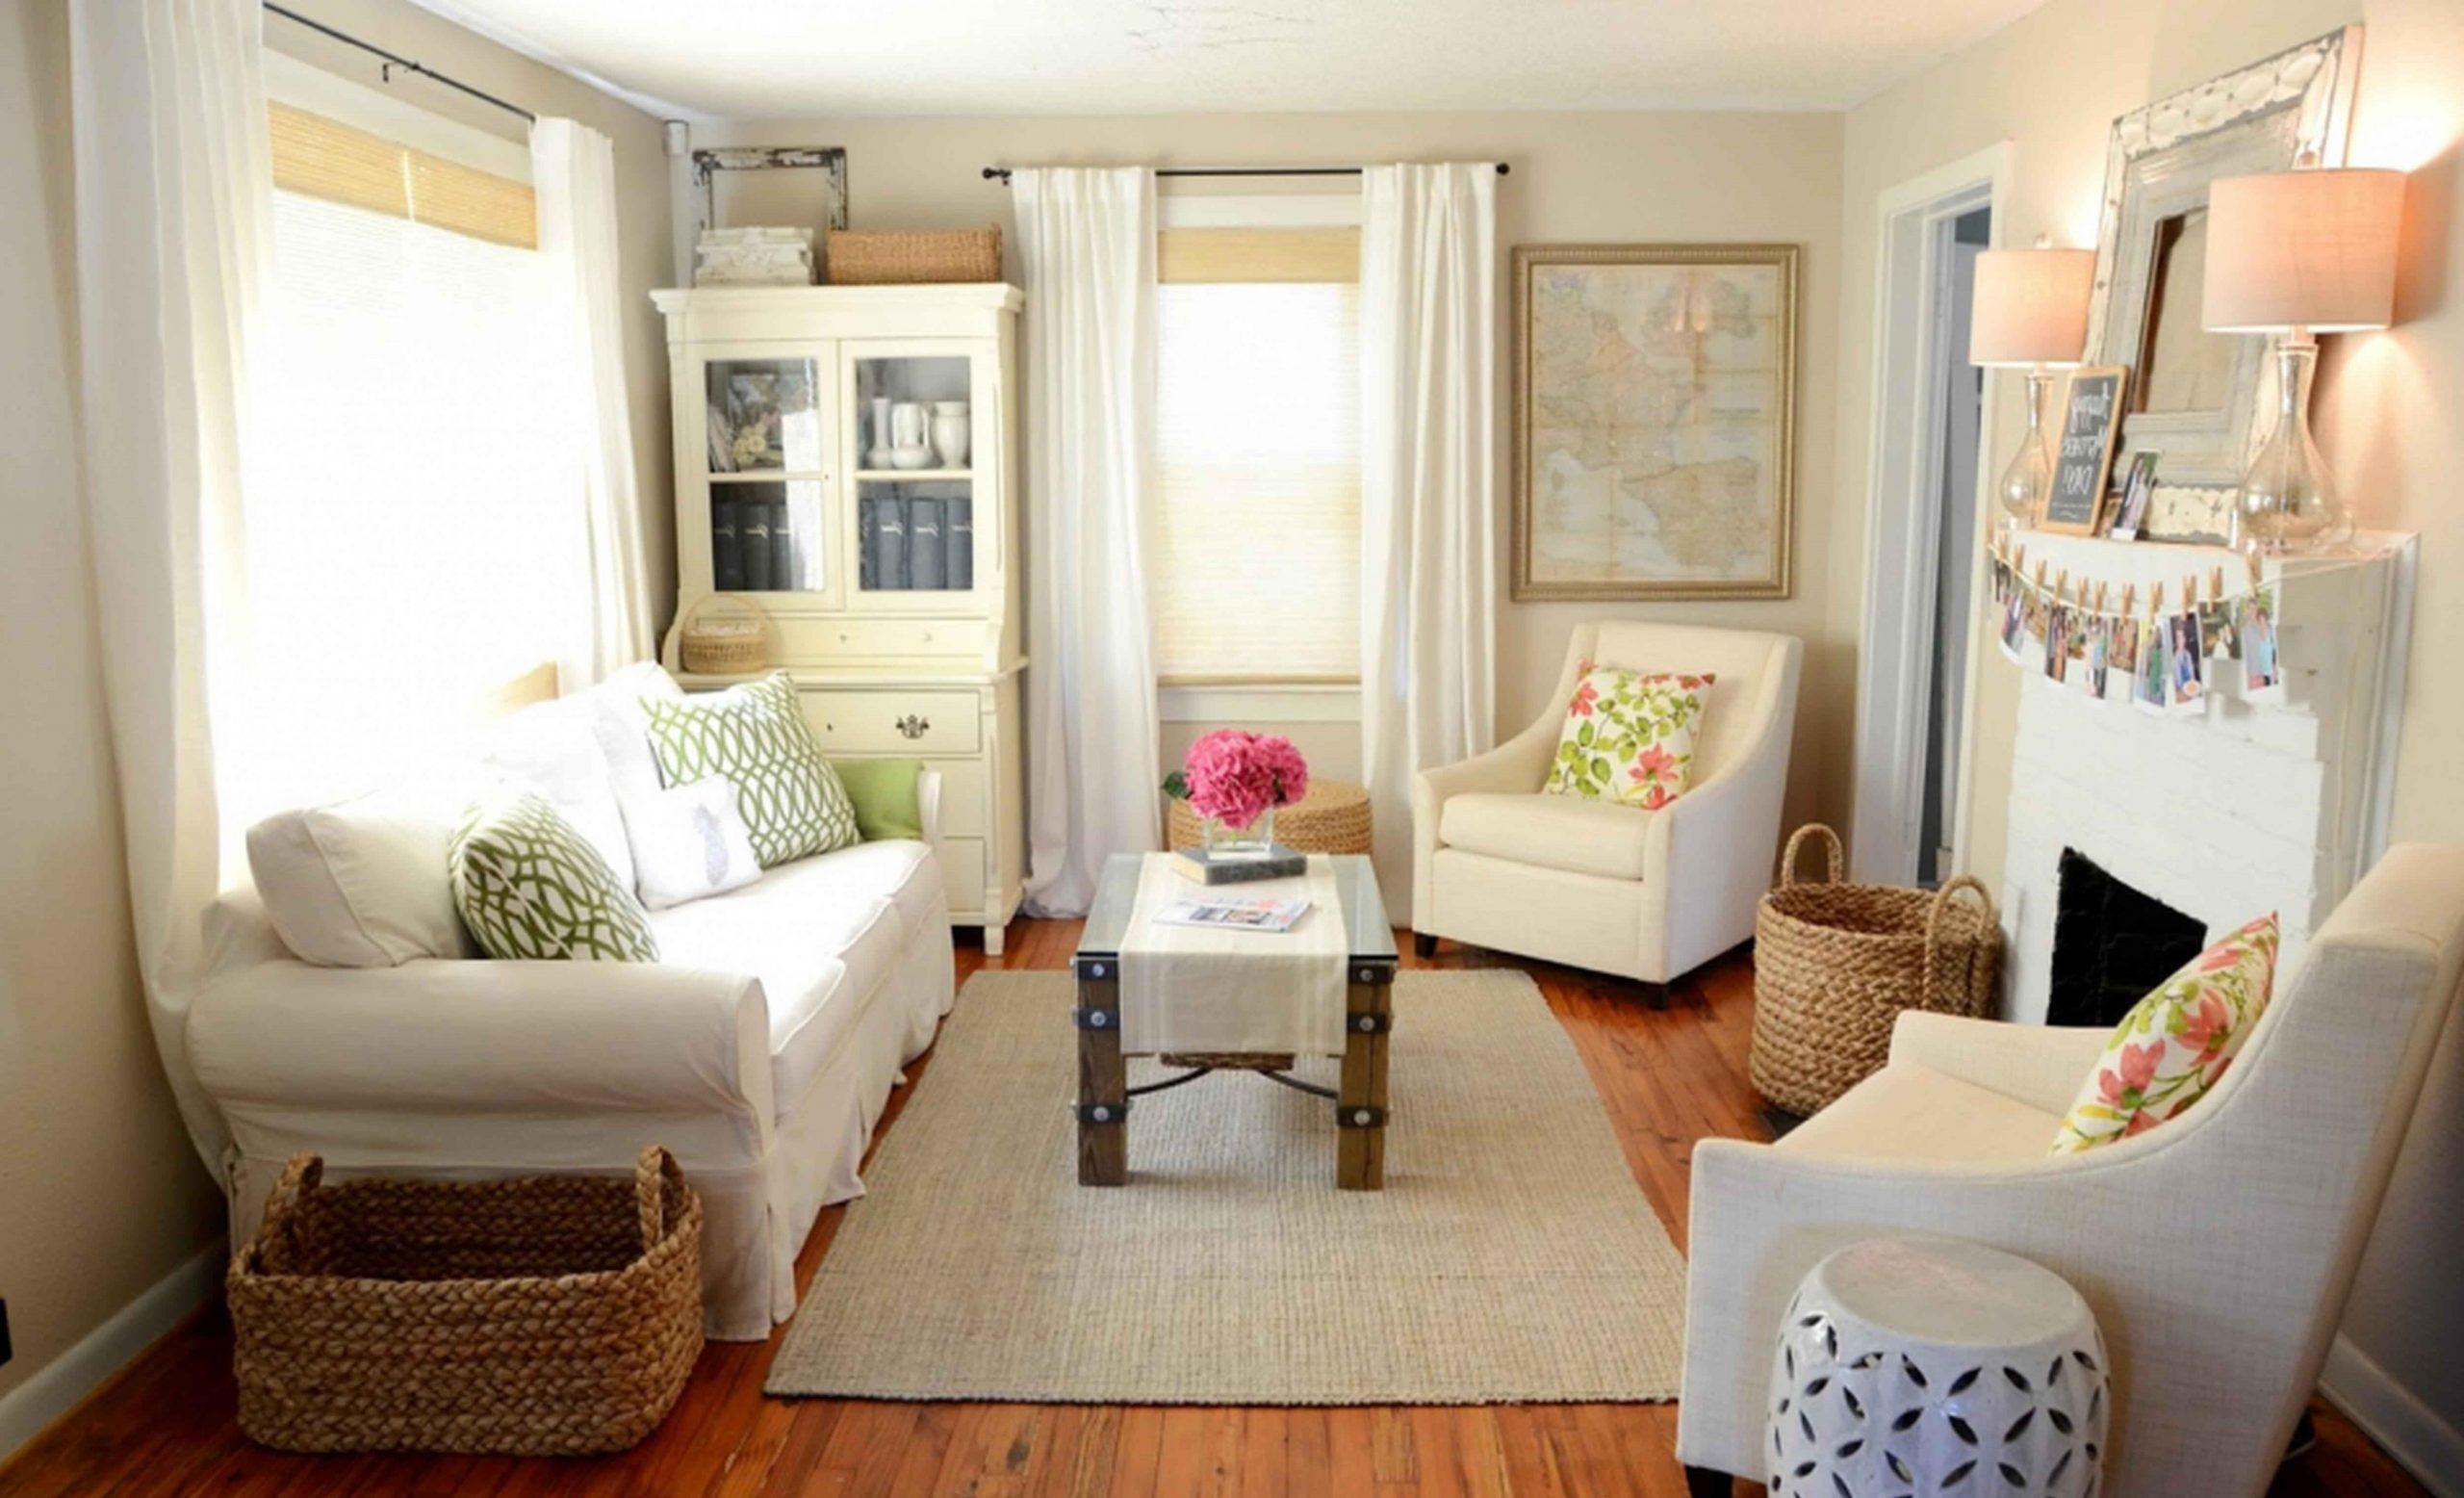 The 8 cardinal sins of Toronto apartment decor that thou shalt  - Rental Apartment Decor Ideas